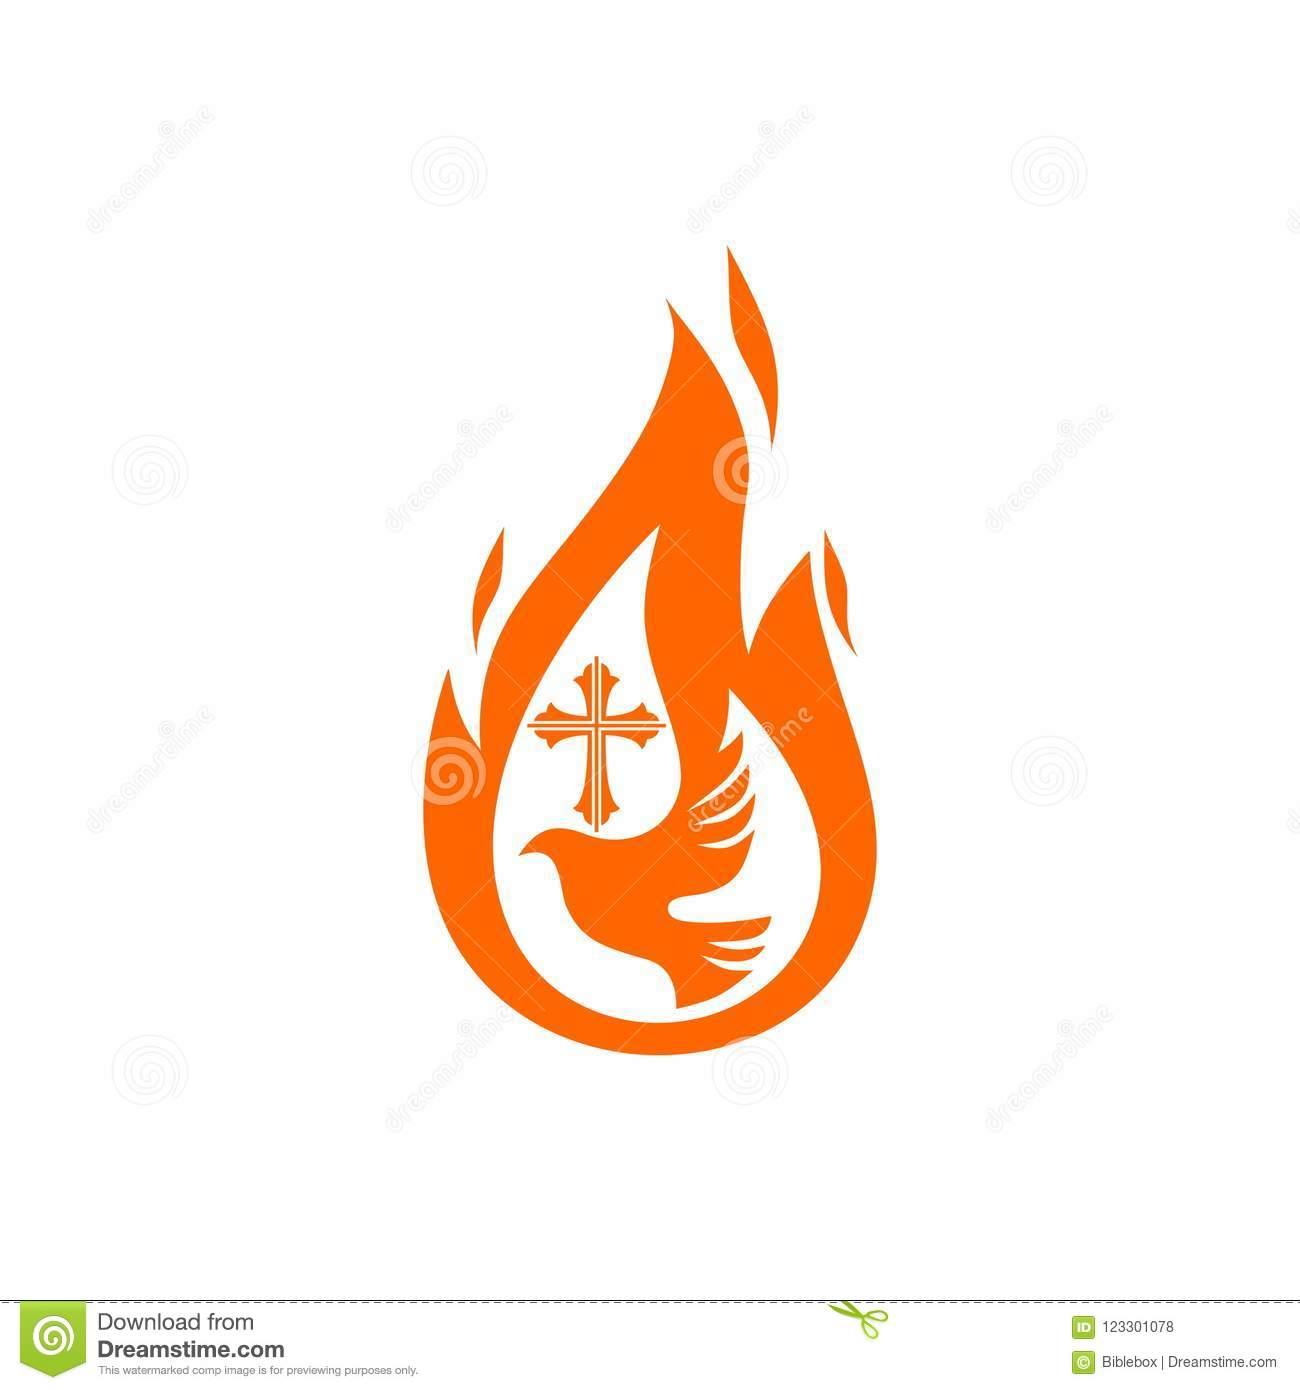 Church Logo. Christian Symbols. Dove, The Flame Of The Holy Spirit.